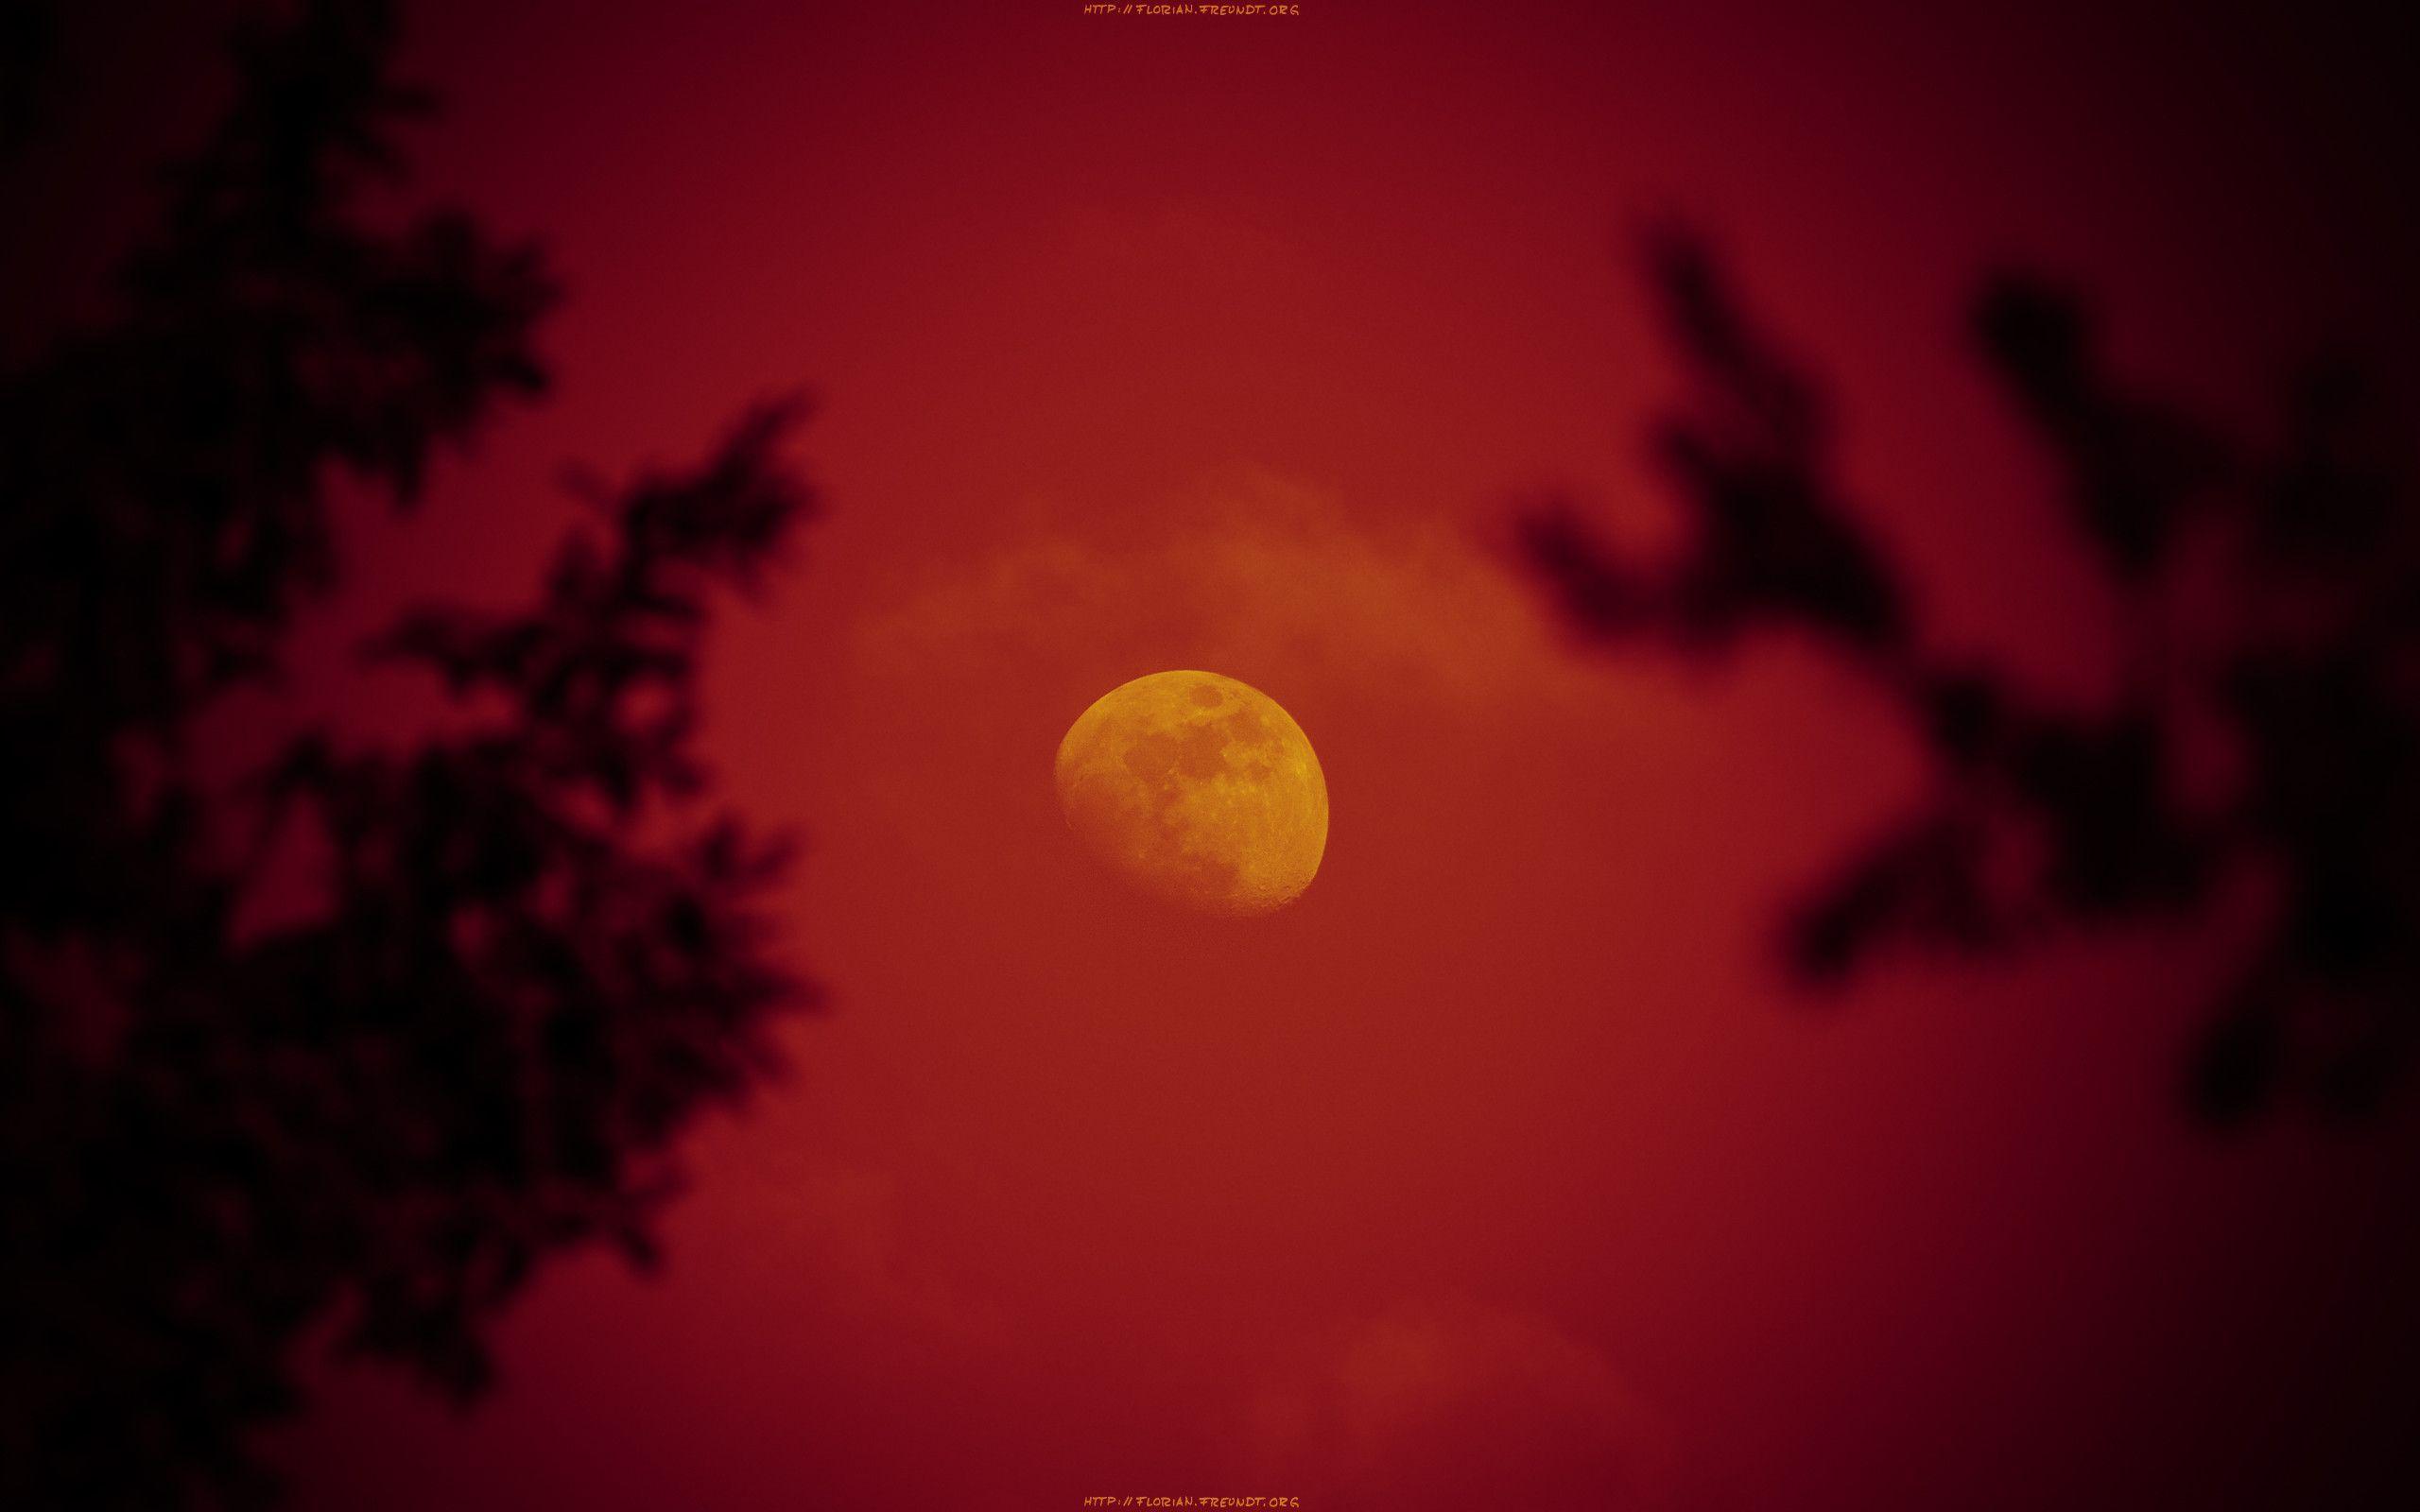 super natural Red Moon Wallpaper